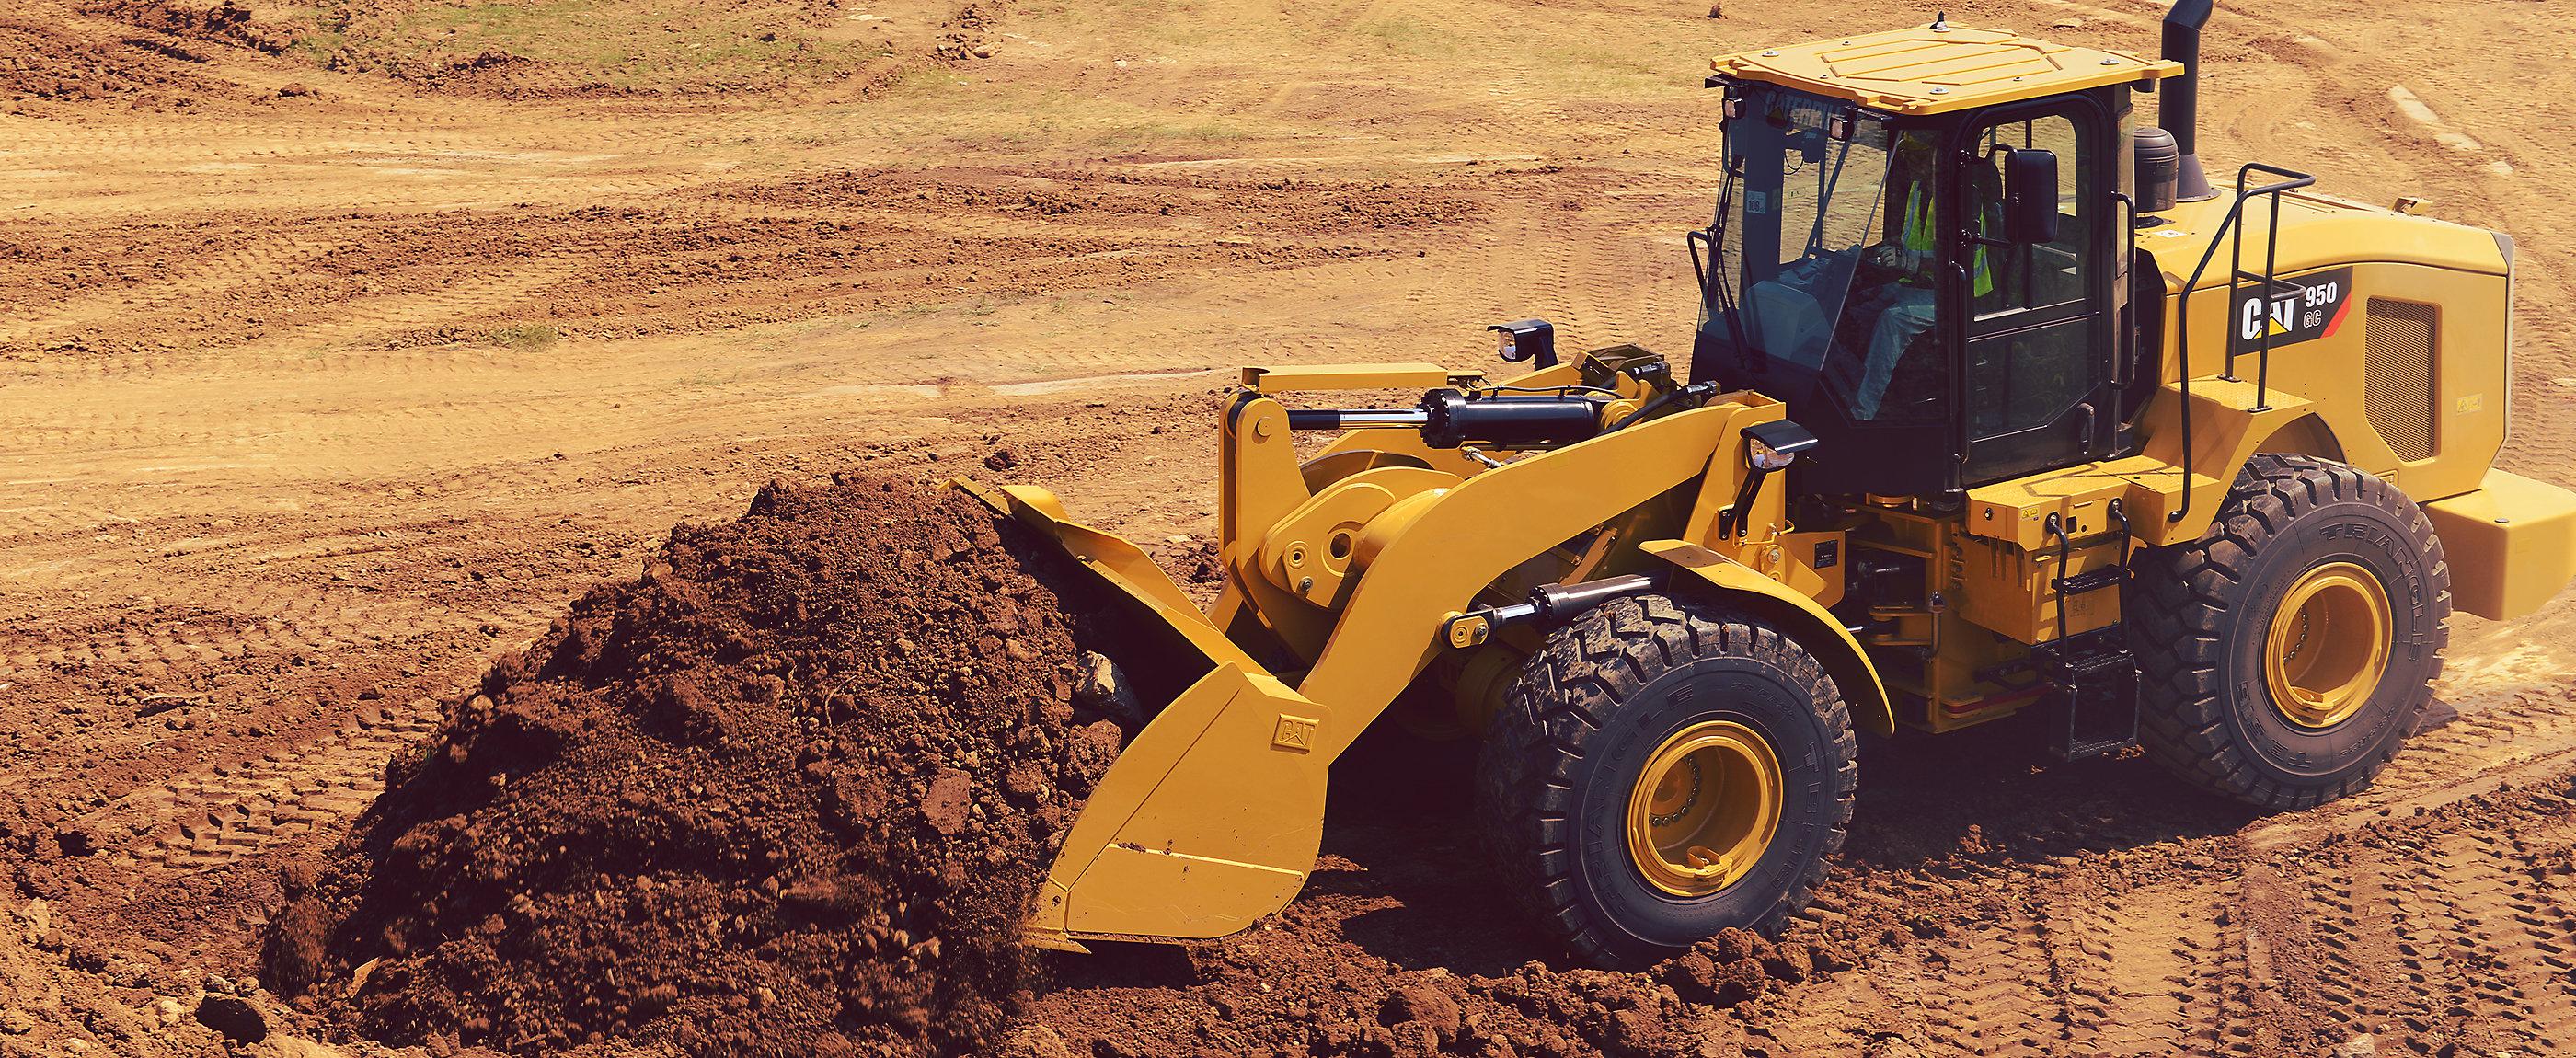 950 GC machine in construction environment